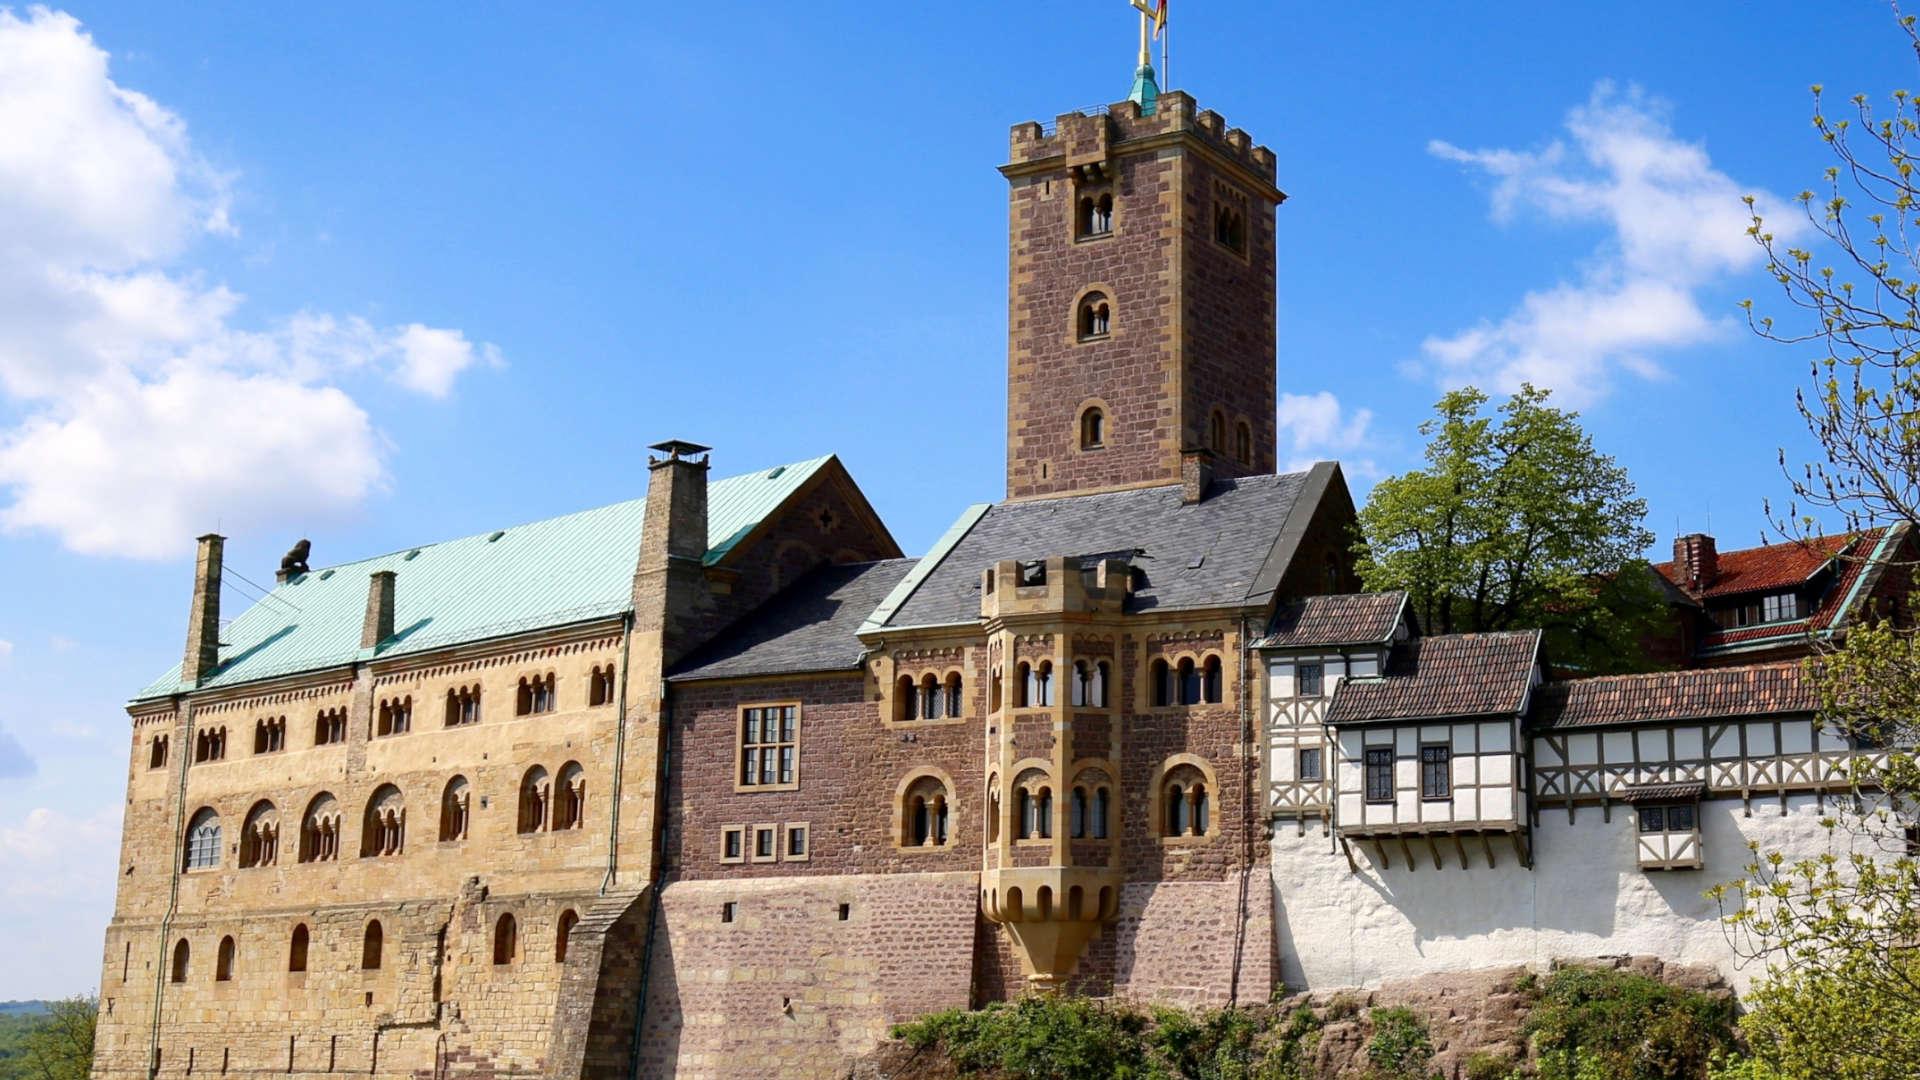 Urlaub & Kultur in Thüringen